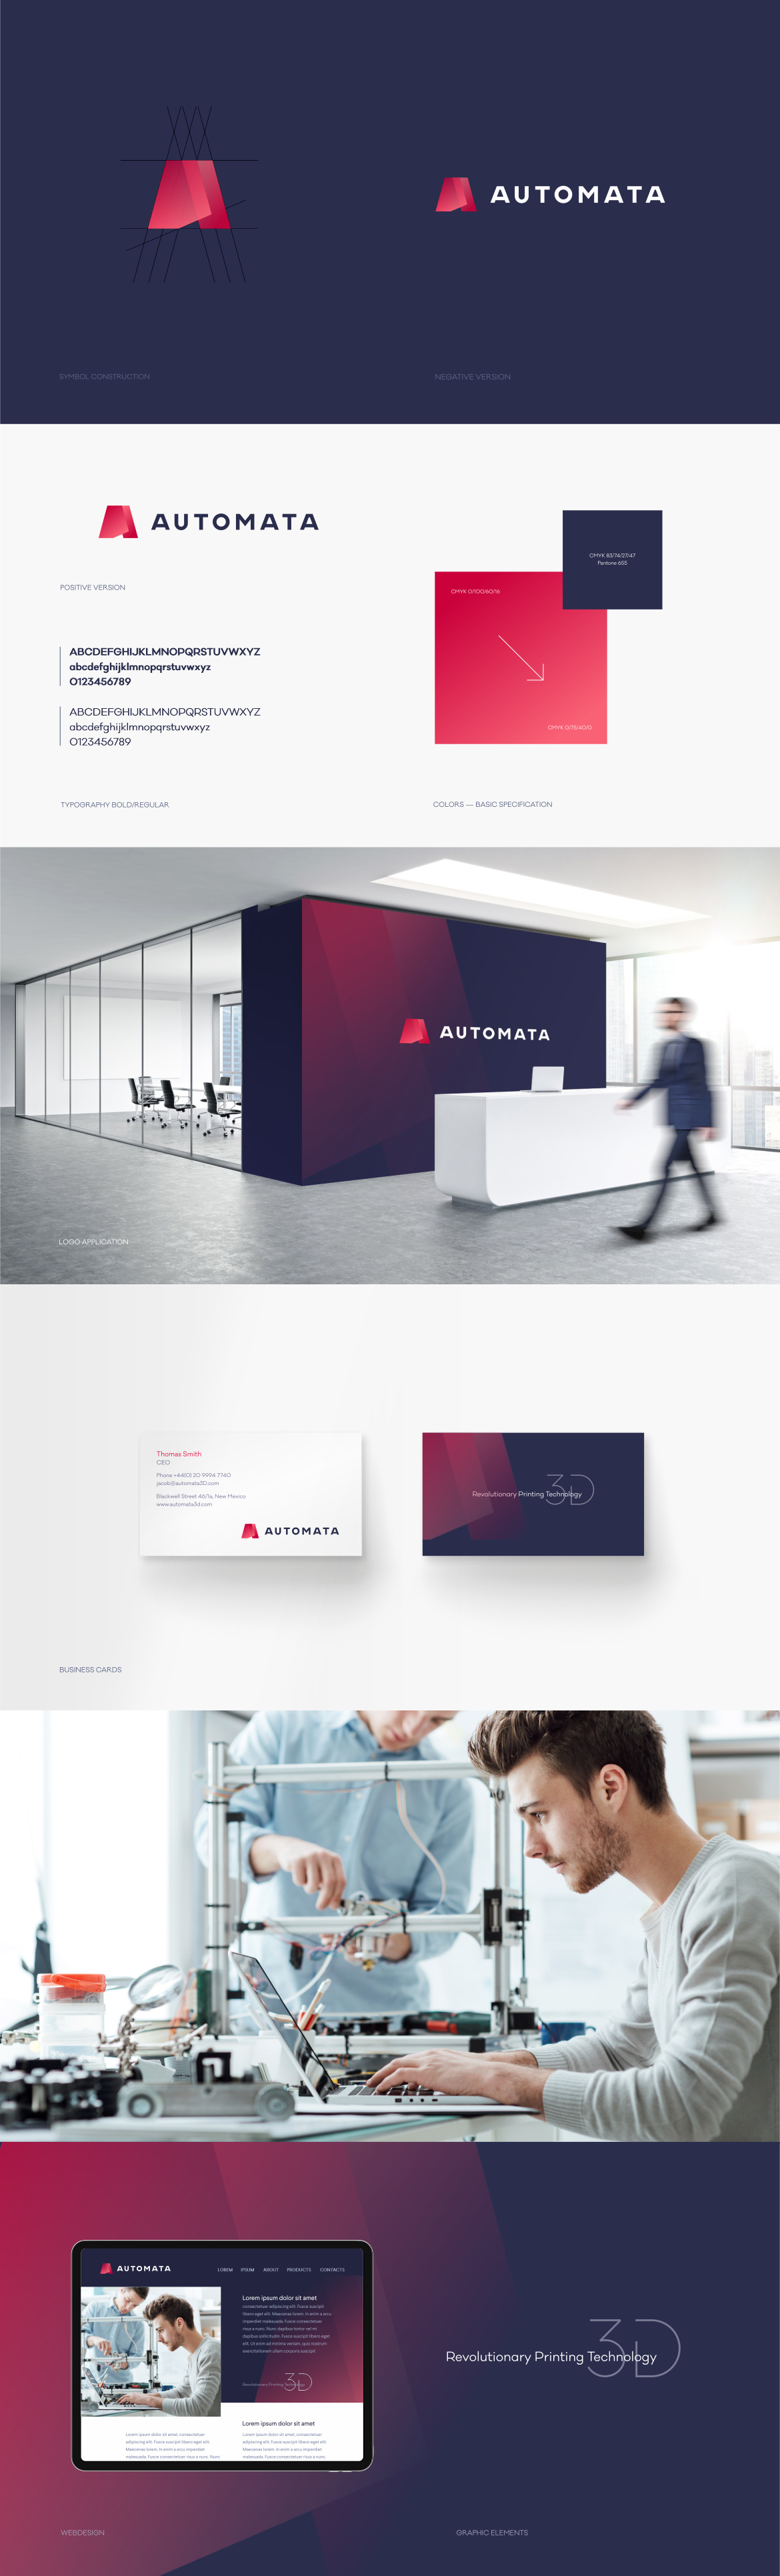 Automata 3D printers logo design Martin Babicek